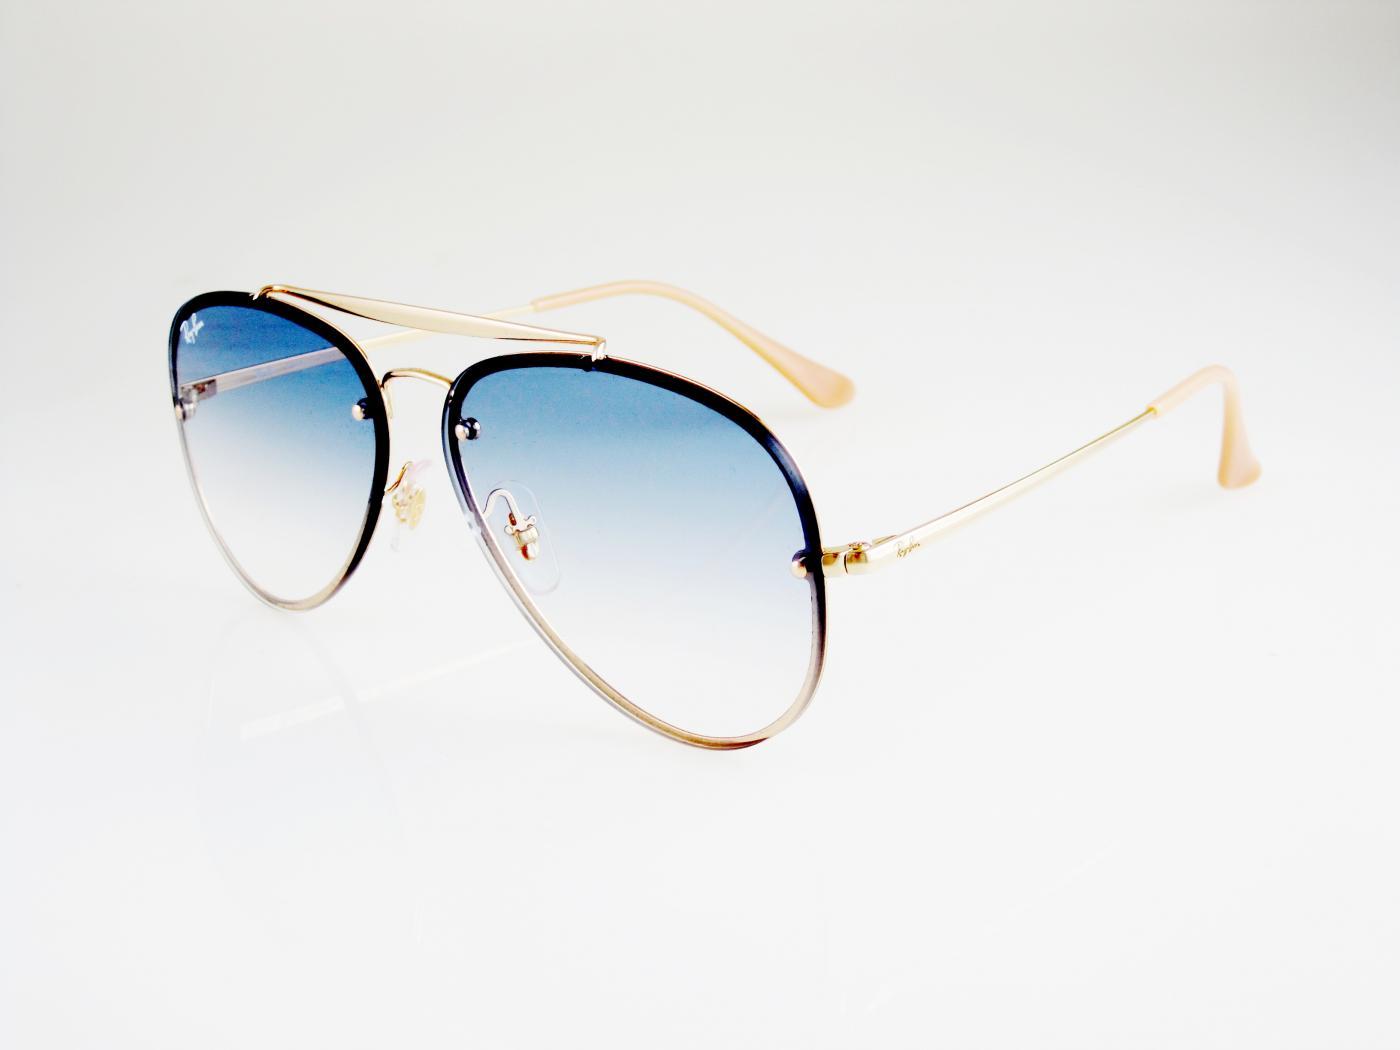 99bac1ea7 Unisex slnečné okuliare Ray Ban - Blaze Aviator | oftalens.sk